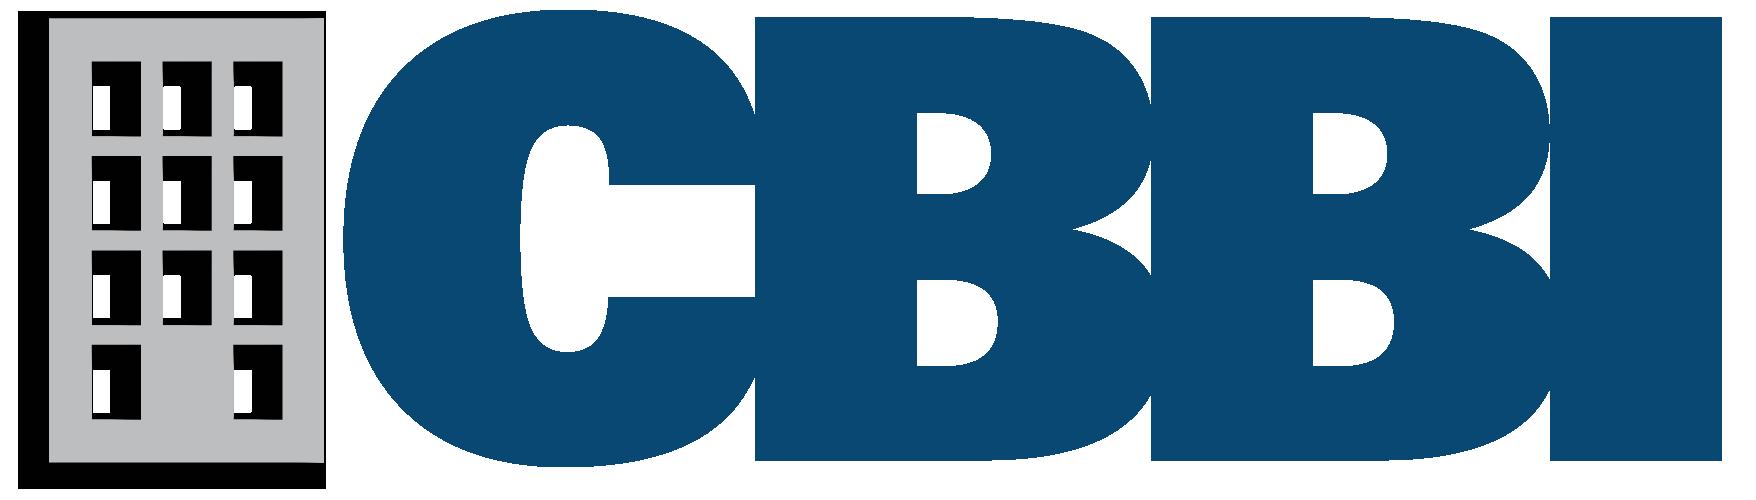 Cleveland Bradley Business Incubator